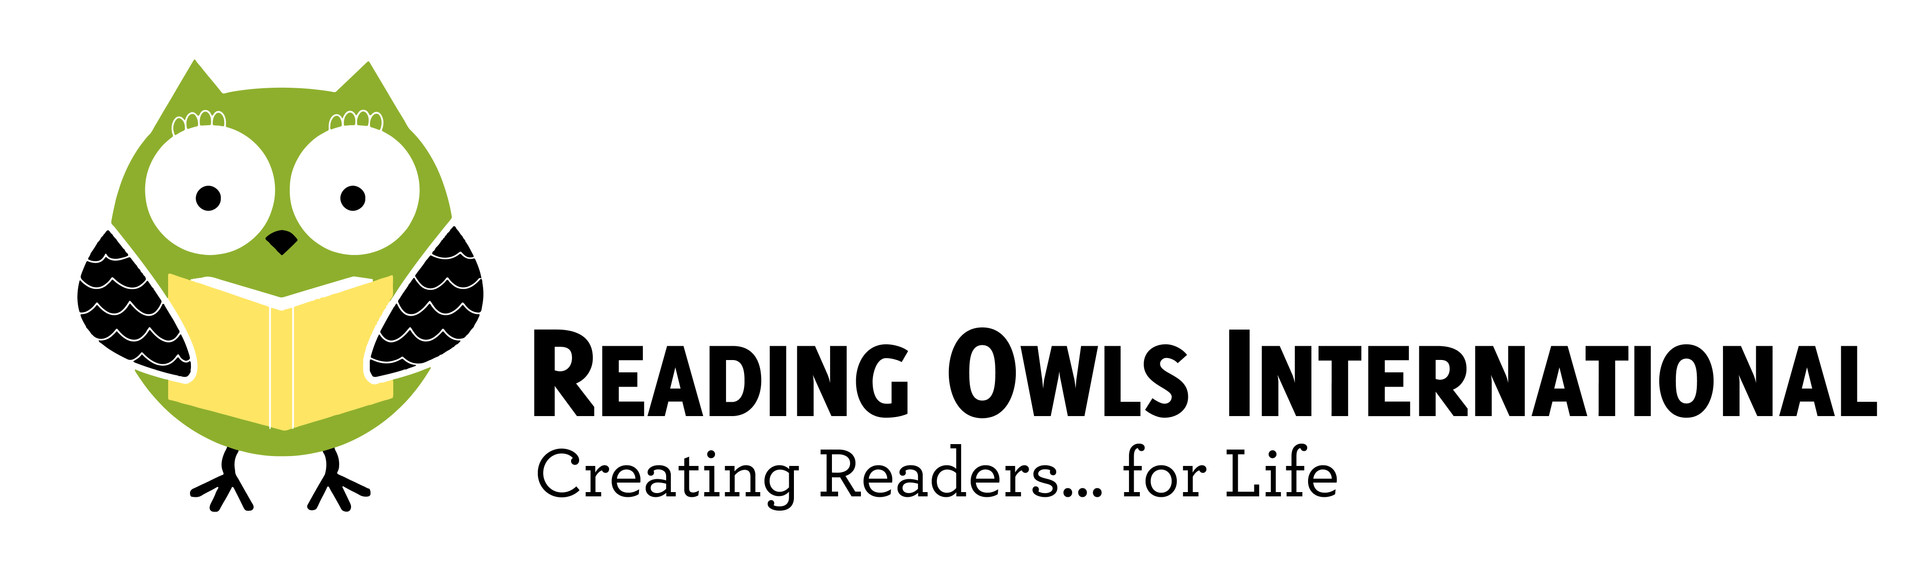 ROI-owl-FINAL.jpg